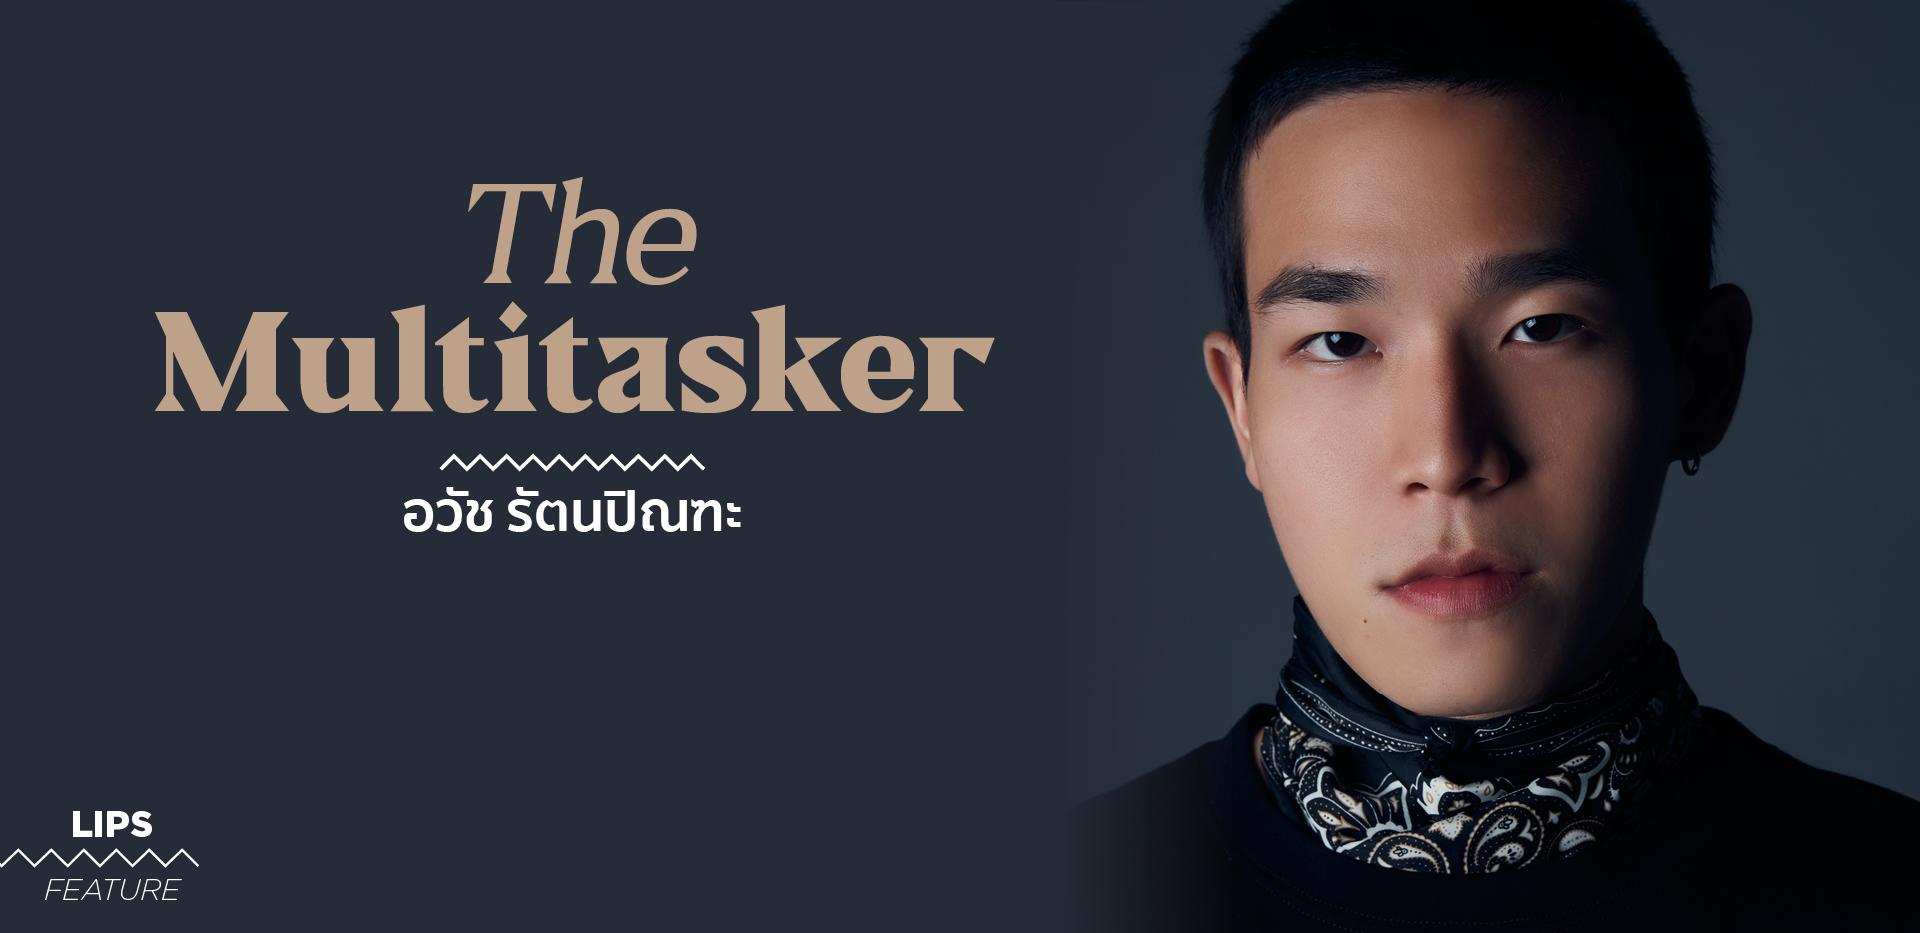 The Multitasker – อวัช รัตนปิณฑะ